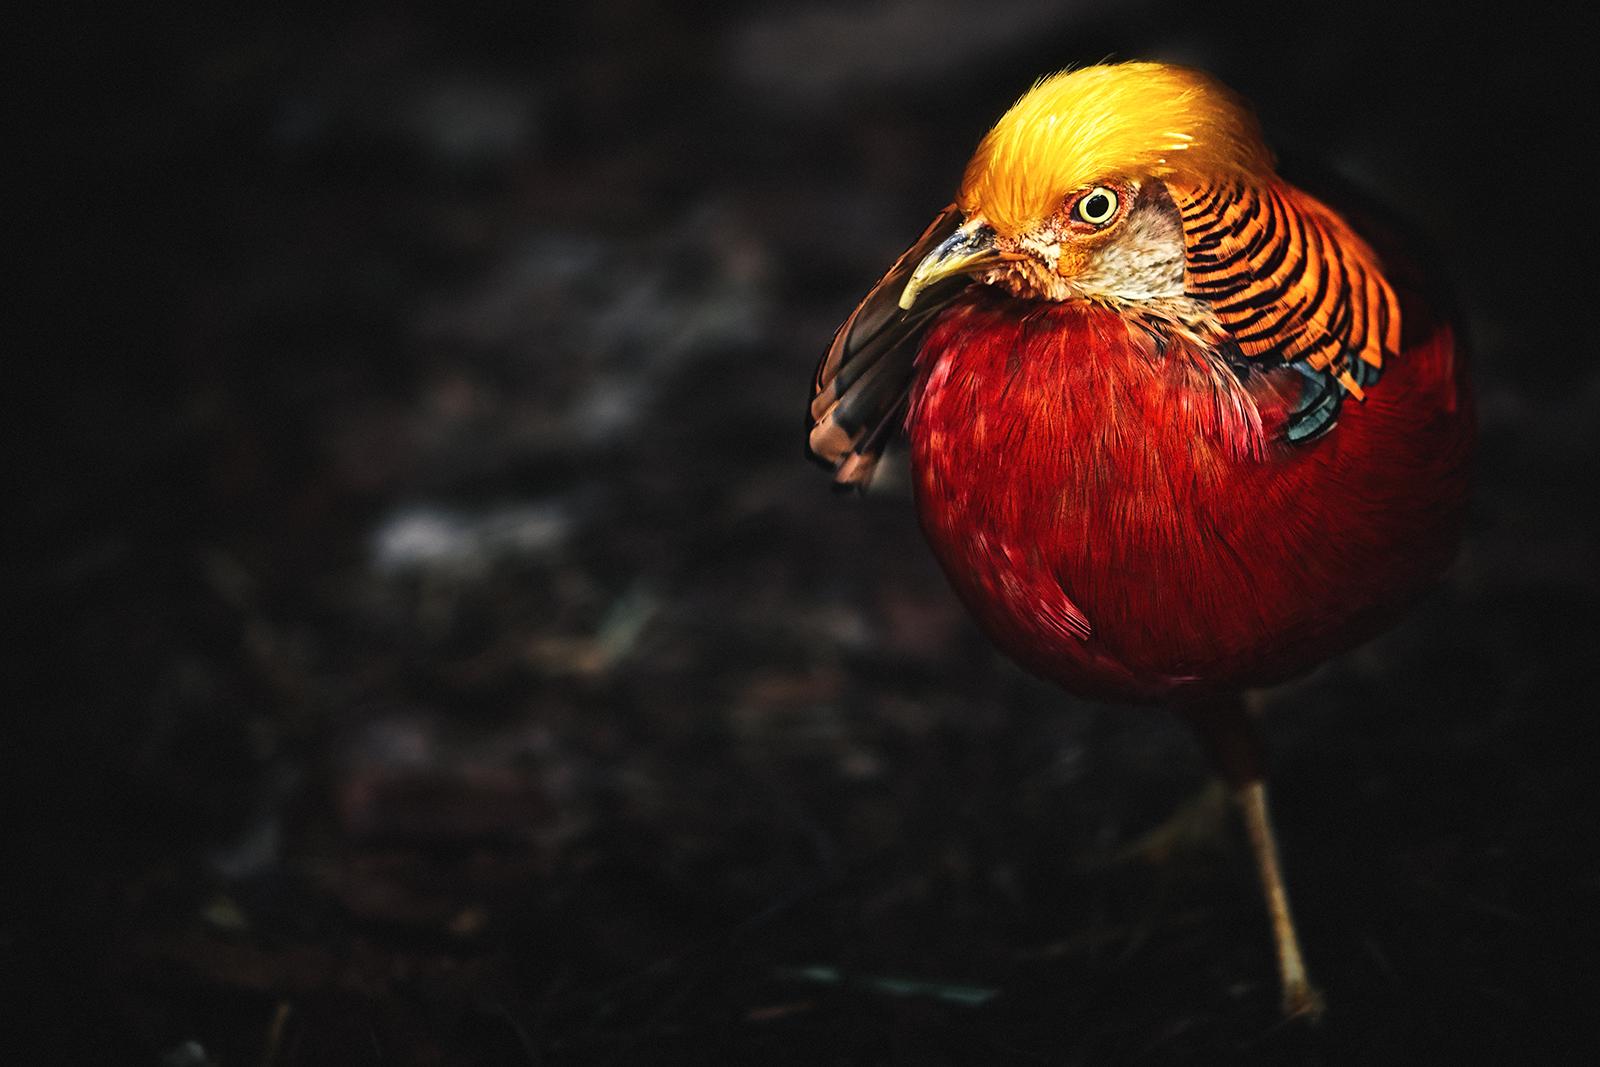 Closeup of a Golden Pheasant